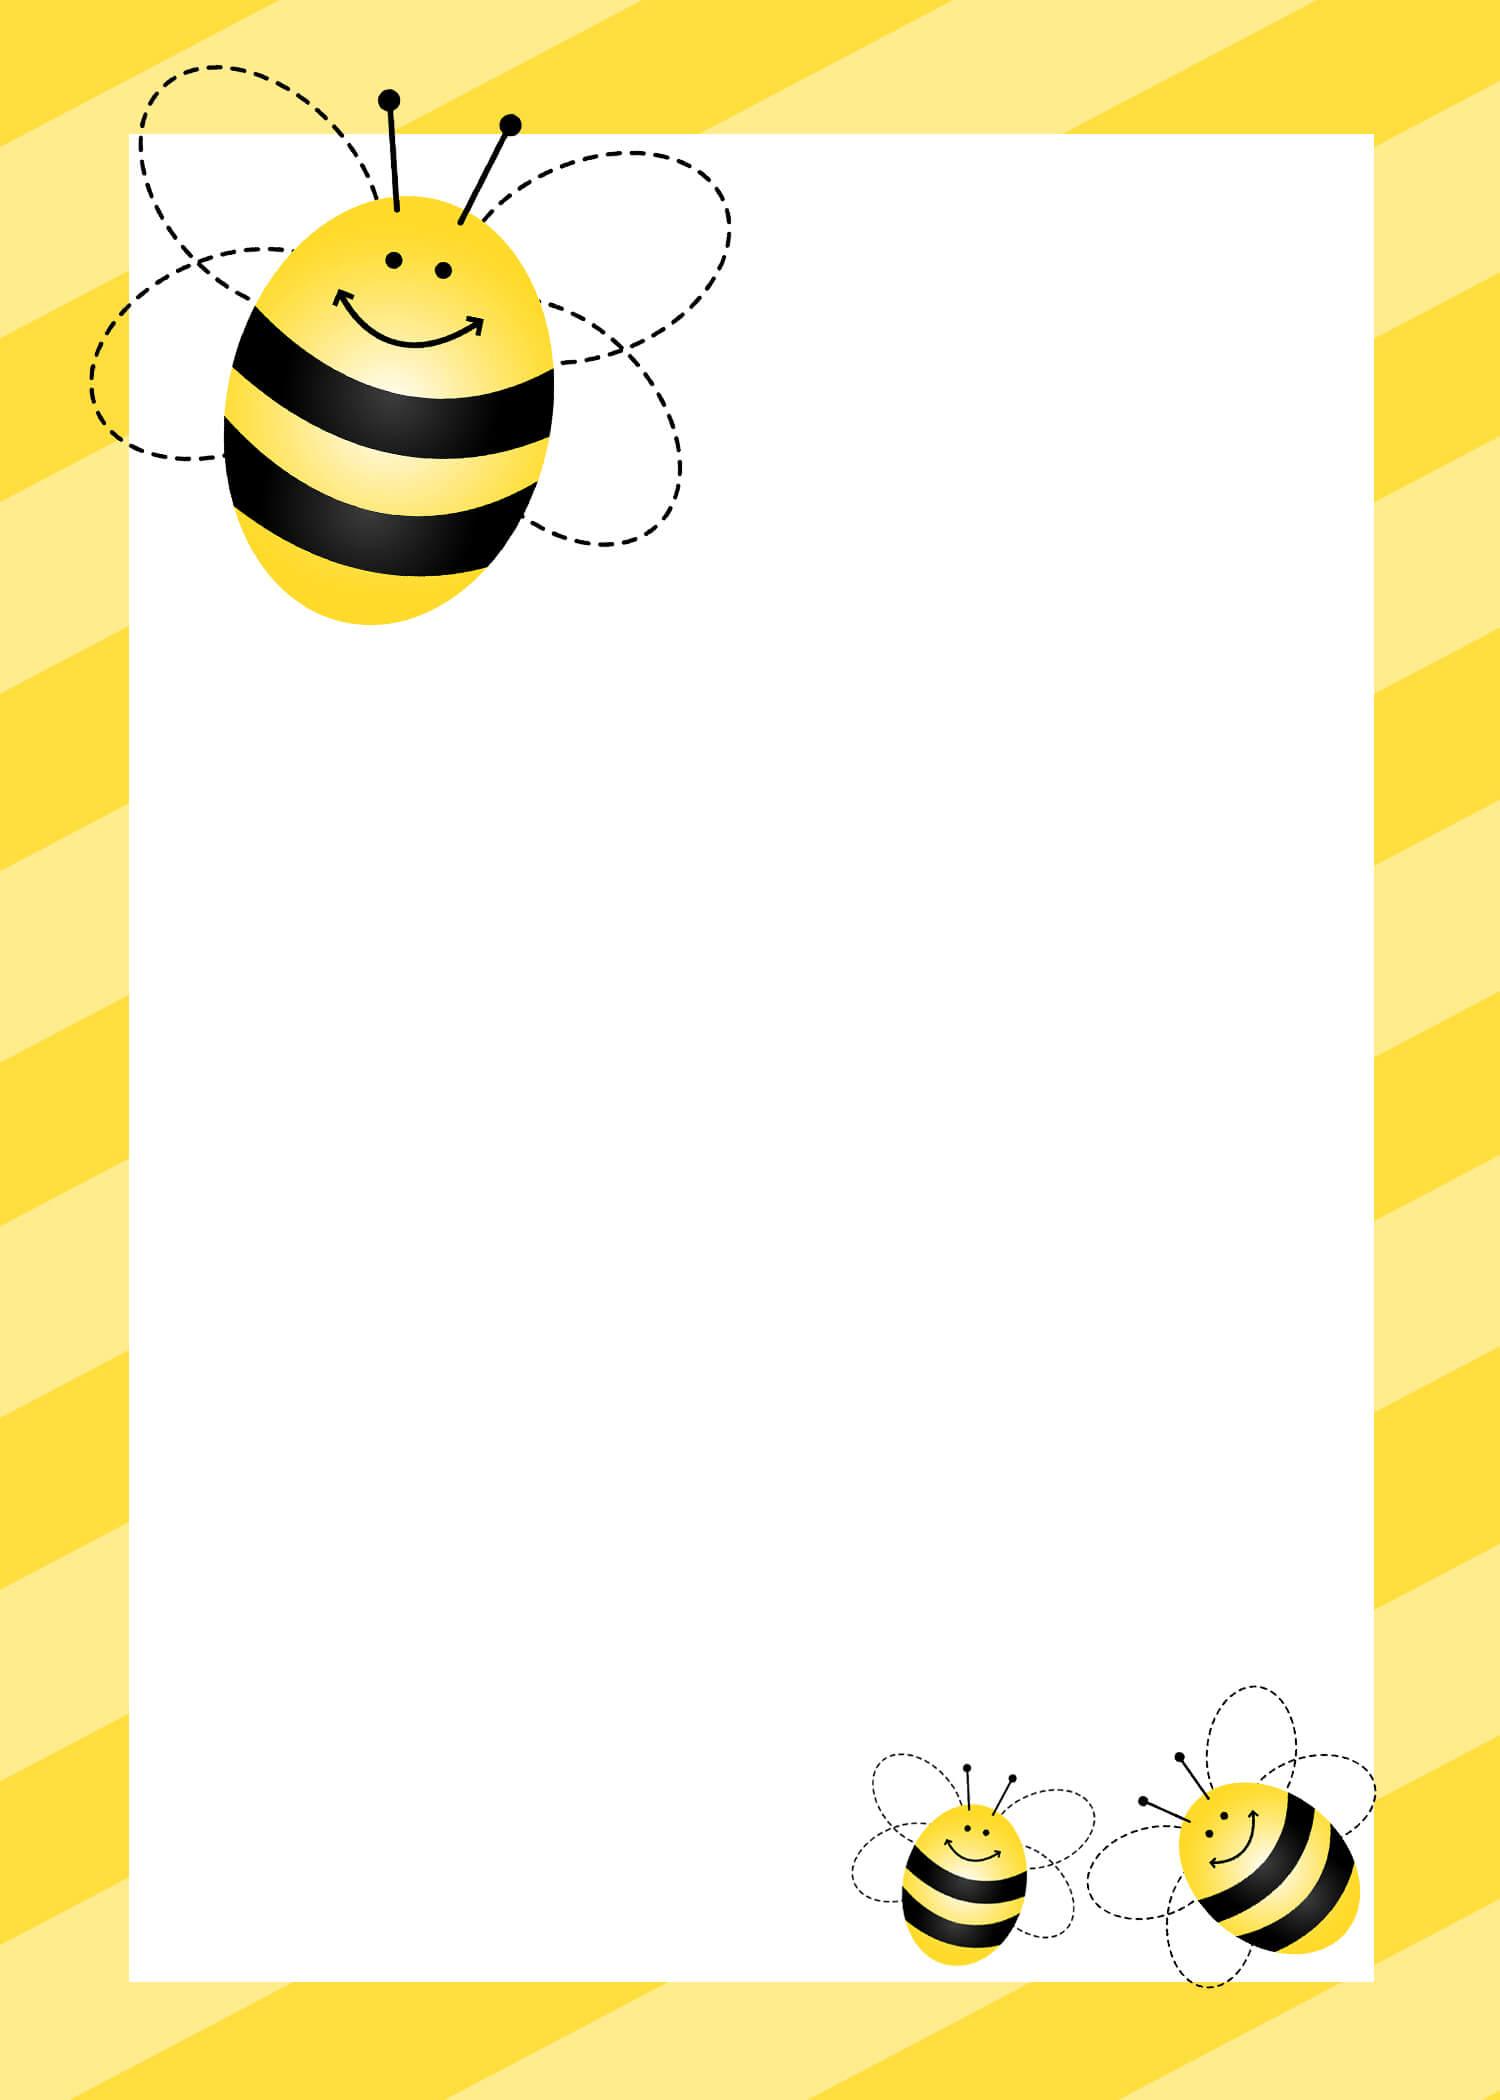 Home Interior Blank Award Certificate Template.editable In Spelling Bee Award Certificate Template